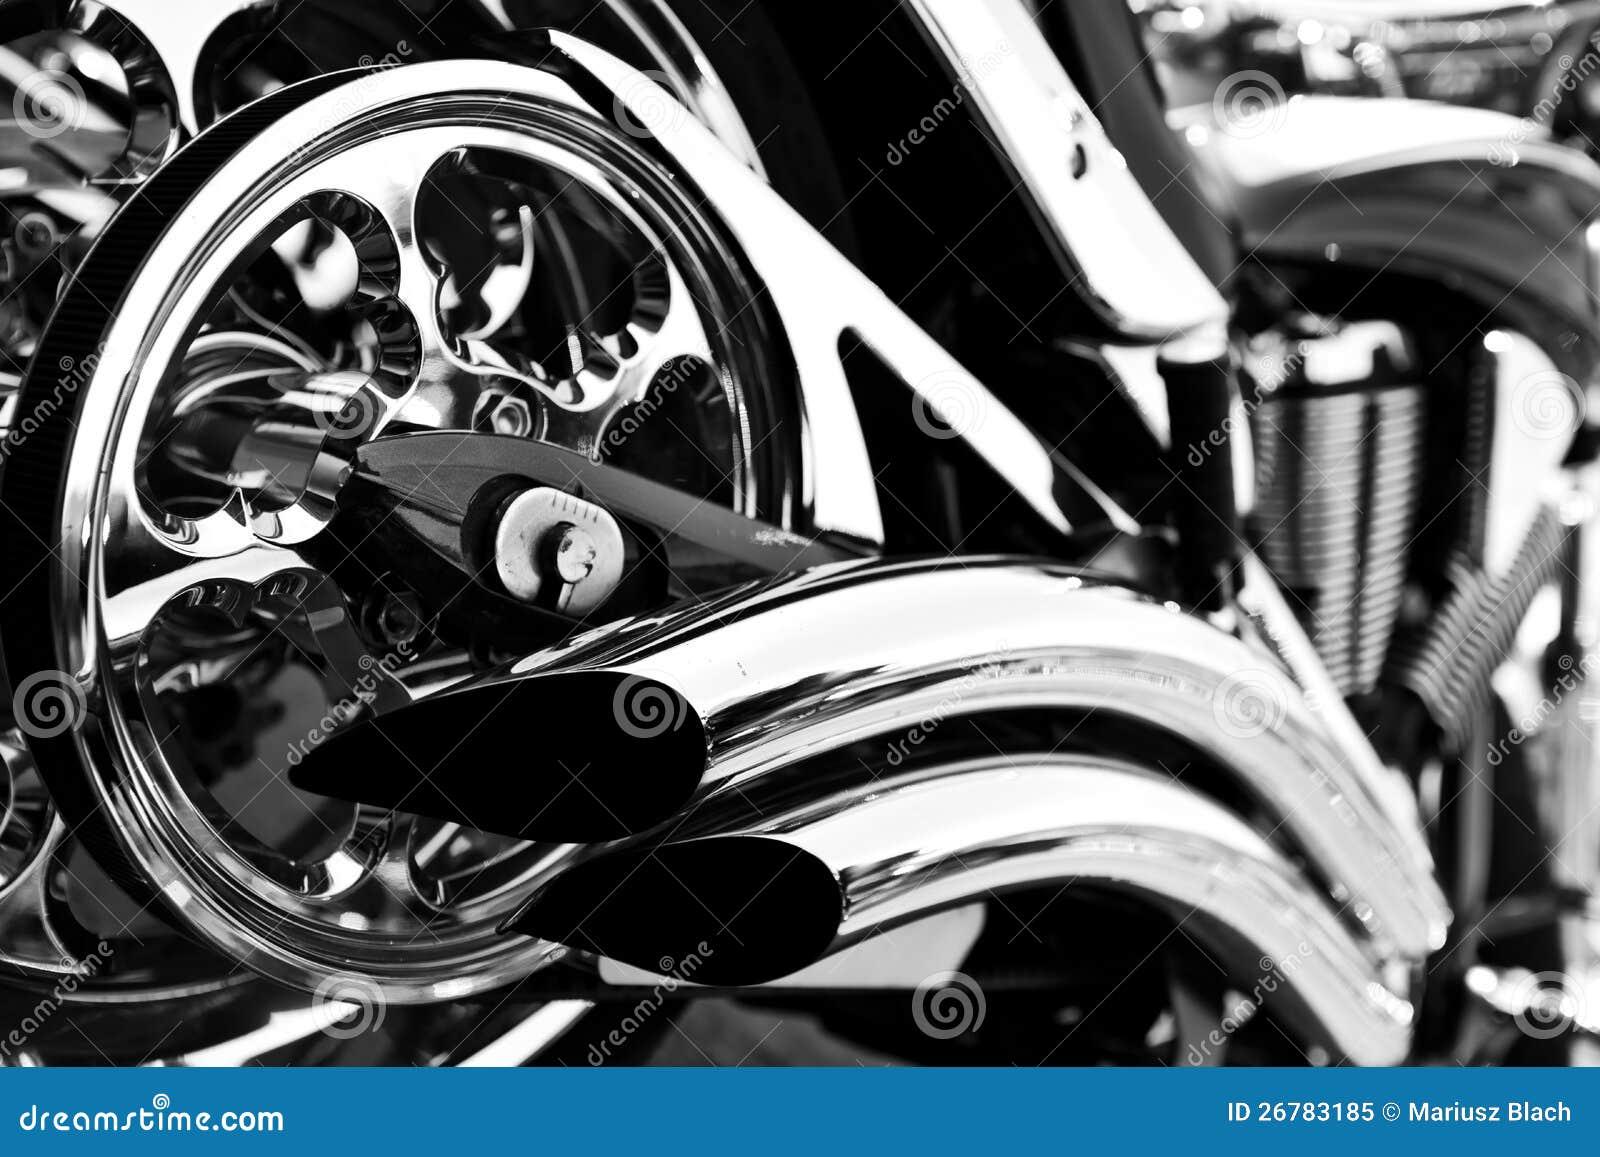 chrome motorcycle cromo motociclo motocicleta motorfiets het chroom motorrad motor motocycle royalty della via auf bicicleta plata koel paare dem